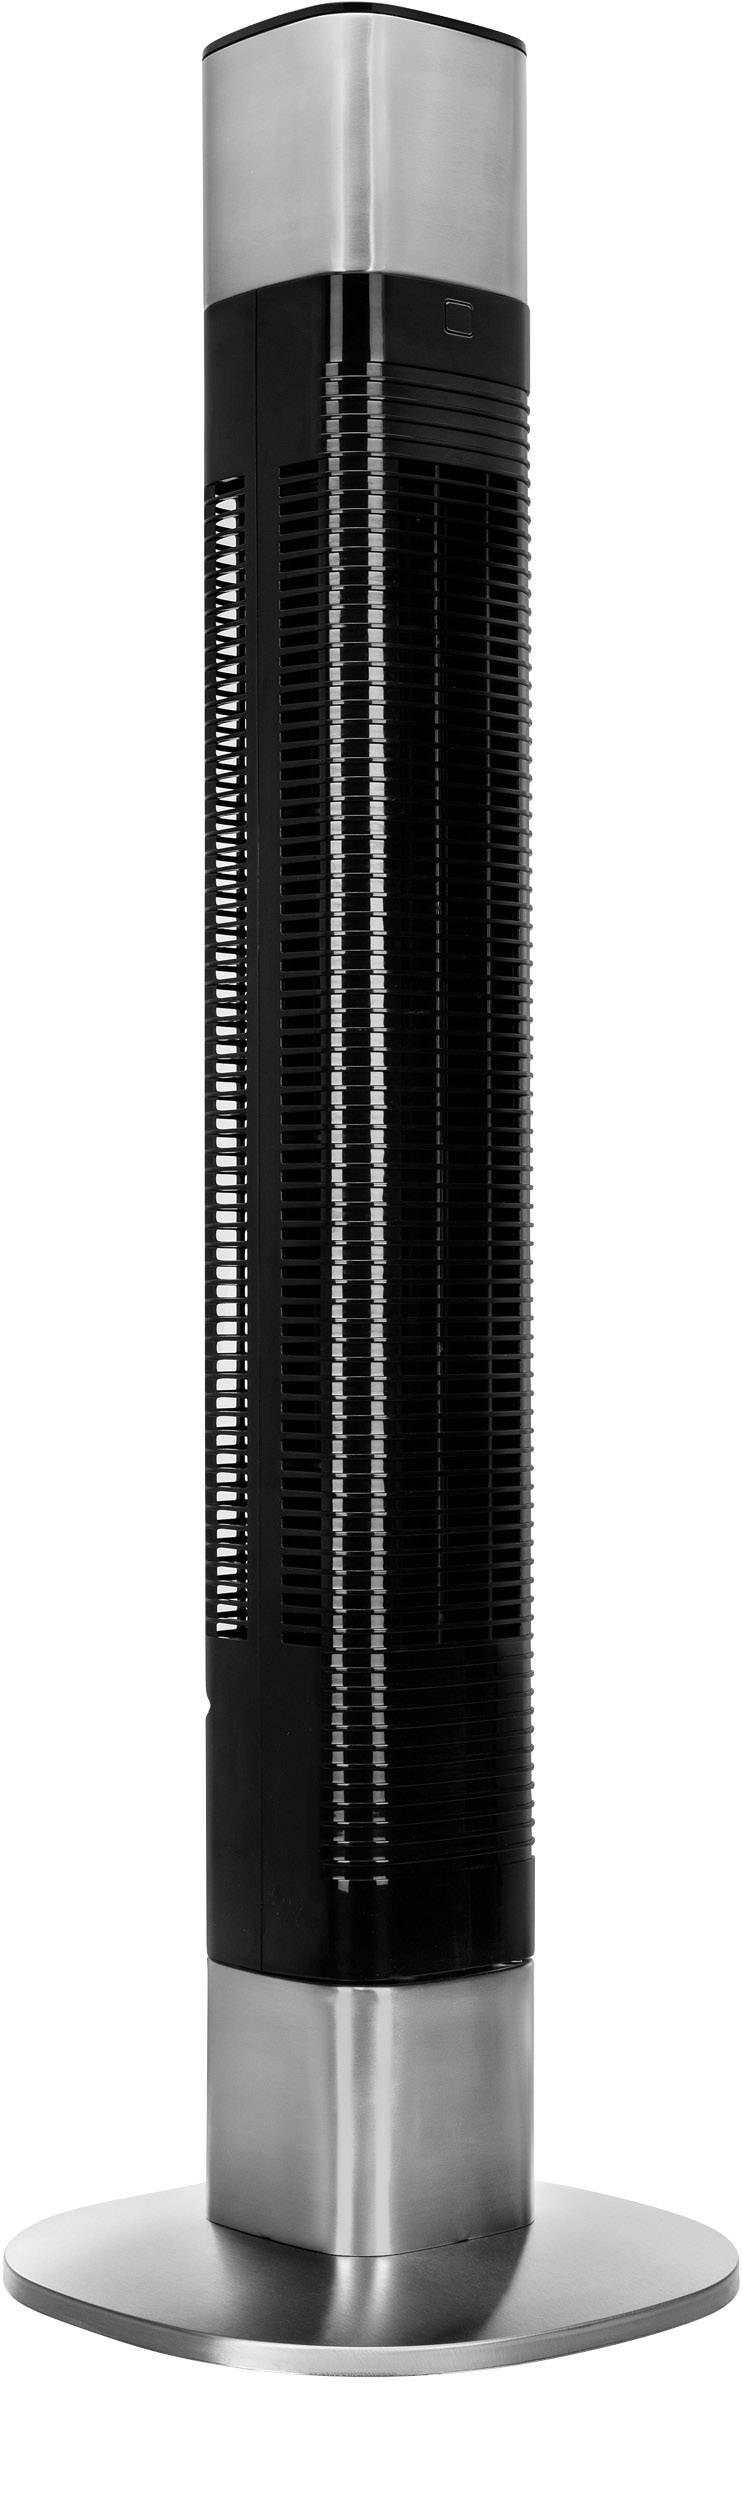 Conrad-Princess  Torenventilator 50 W (l x b x h) 14.7 x 29.5 x 103 cm Zwart, Zilver-aanbieding